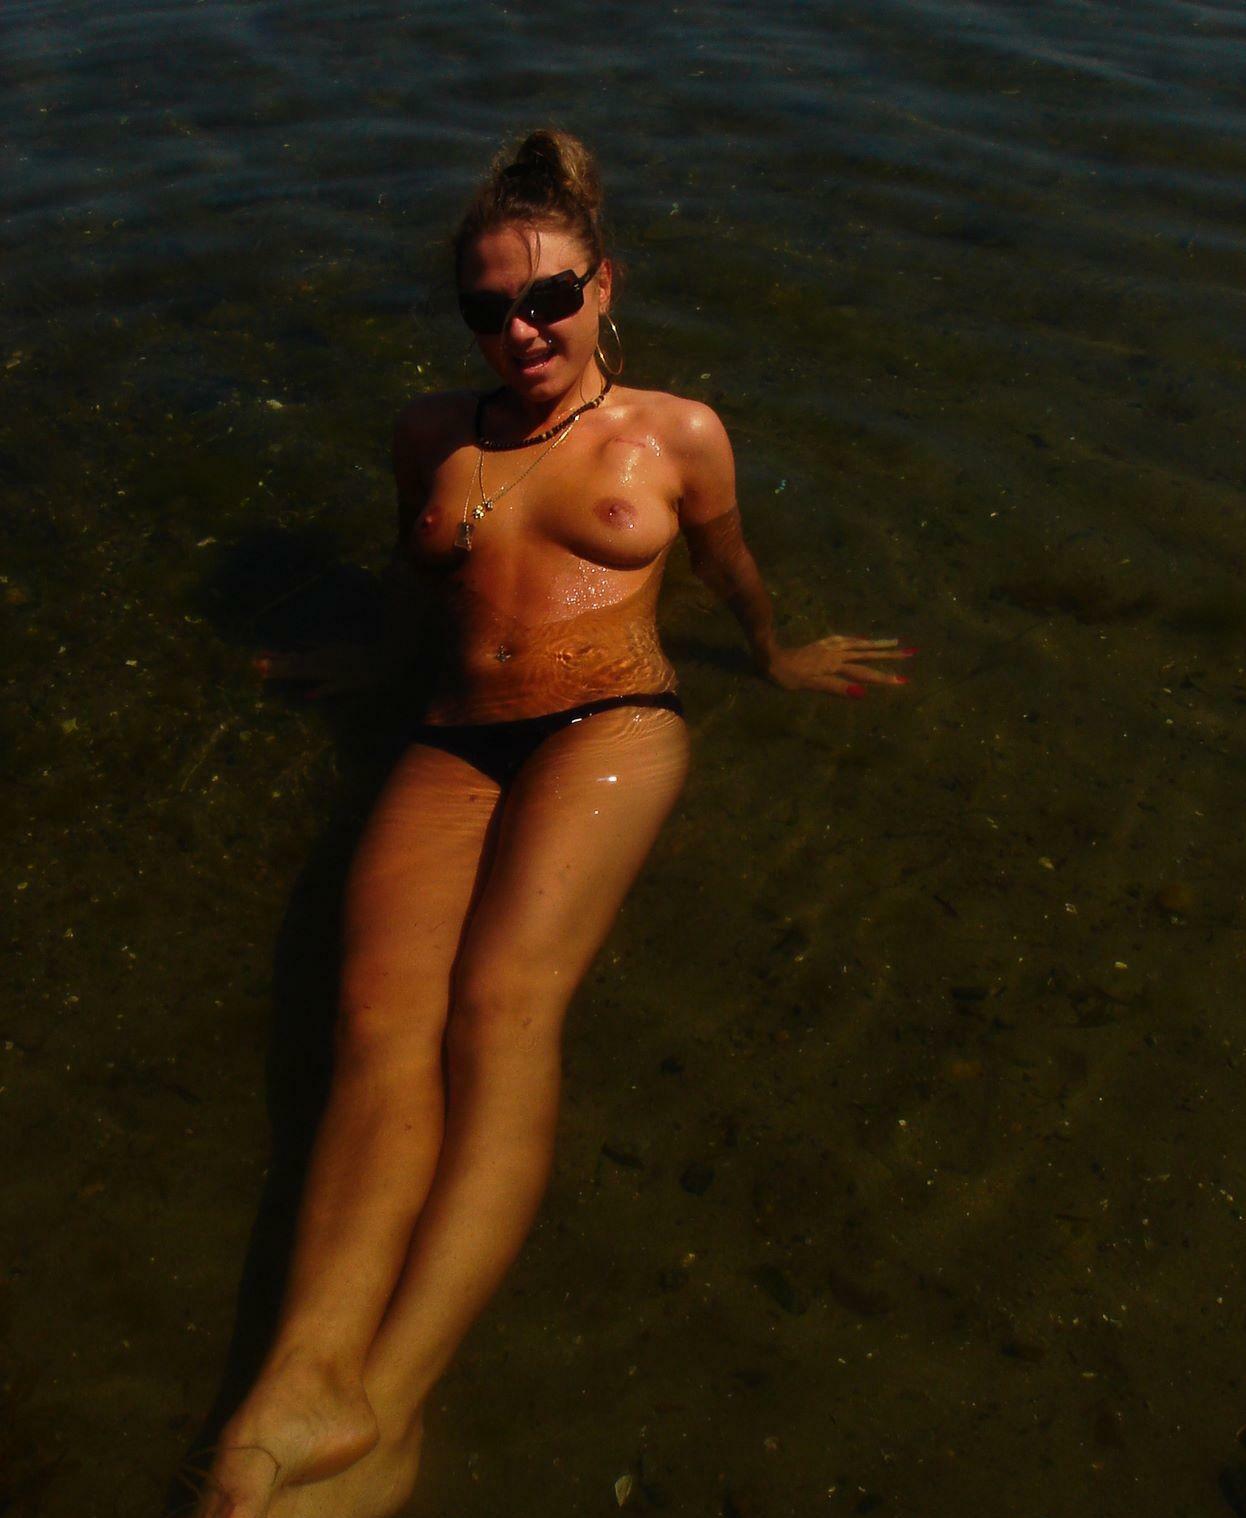 Semi nude girl goofs around the lake